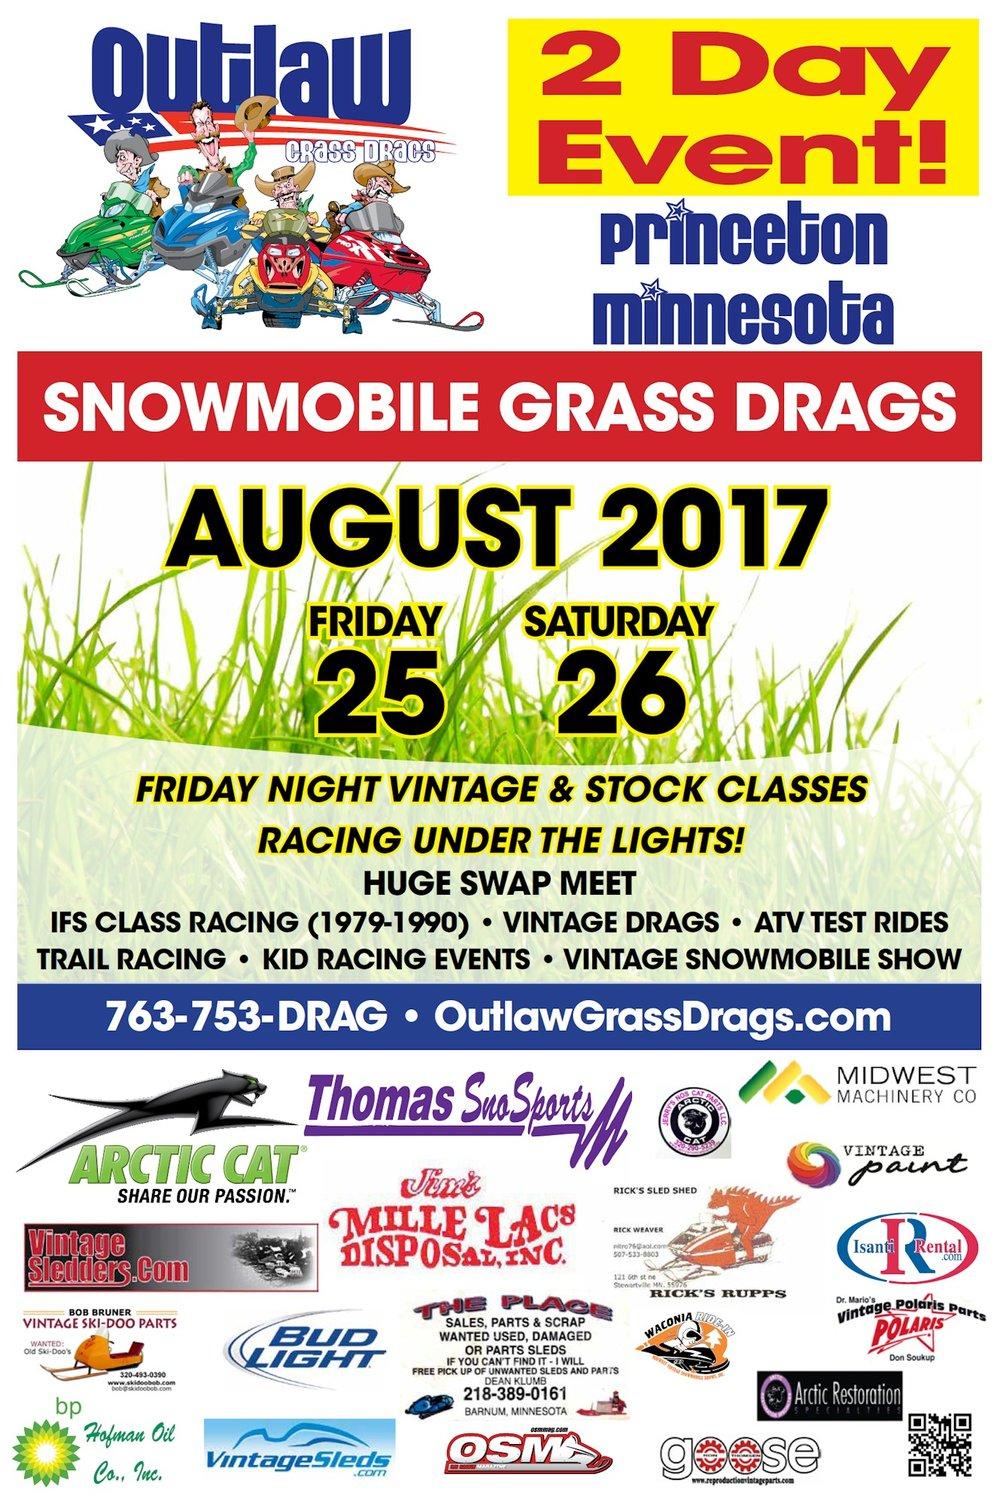 Outlaw Grass Drgas poster 2017.jpg